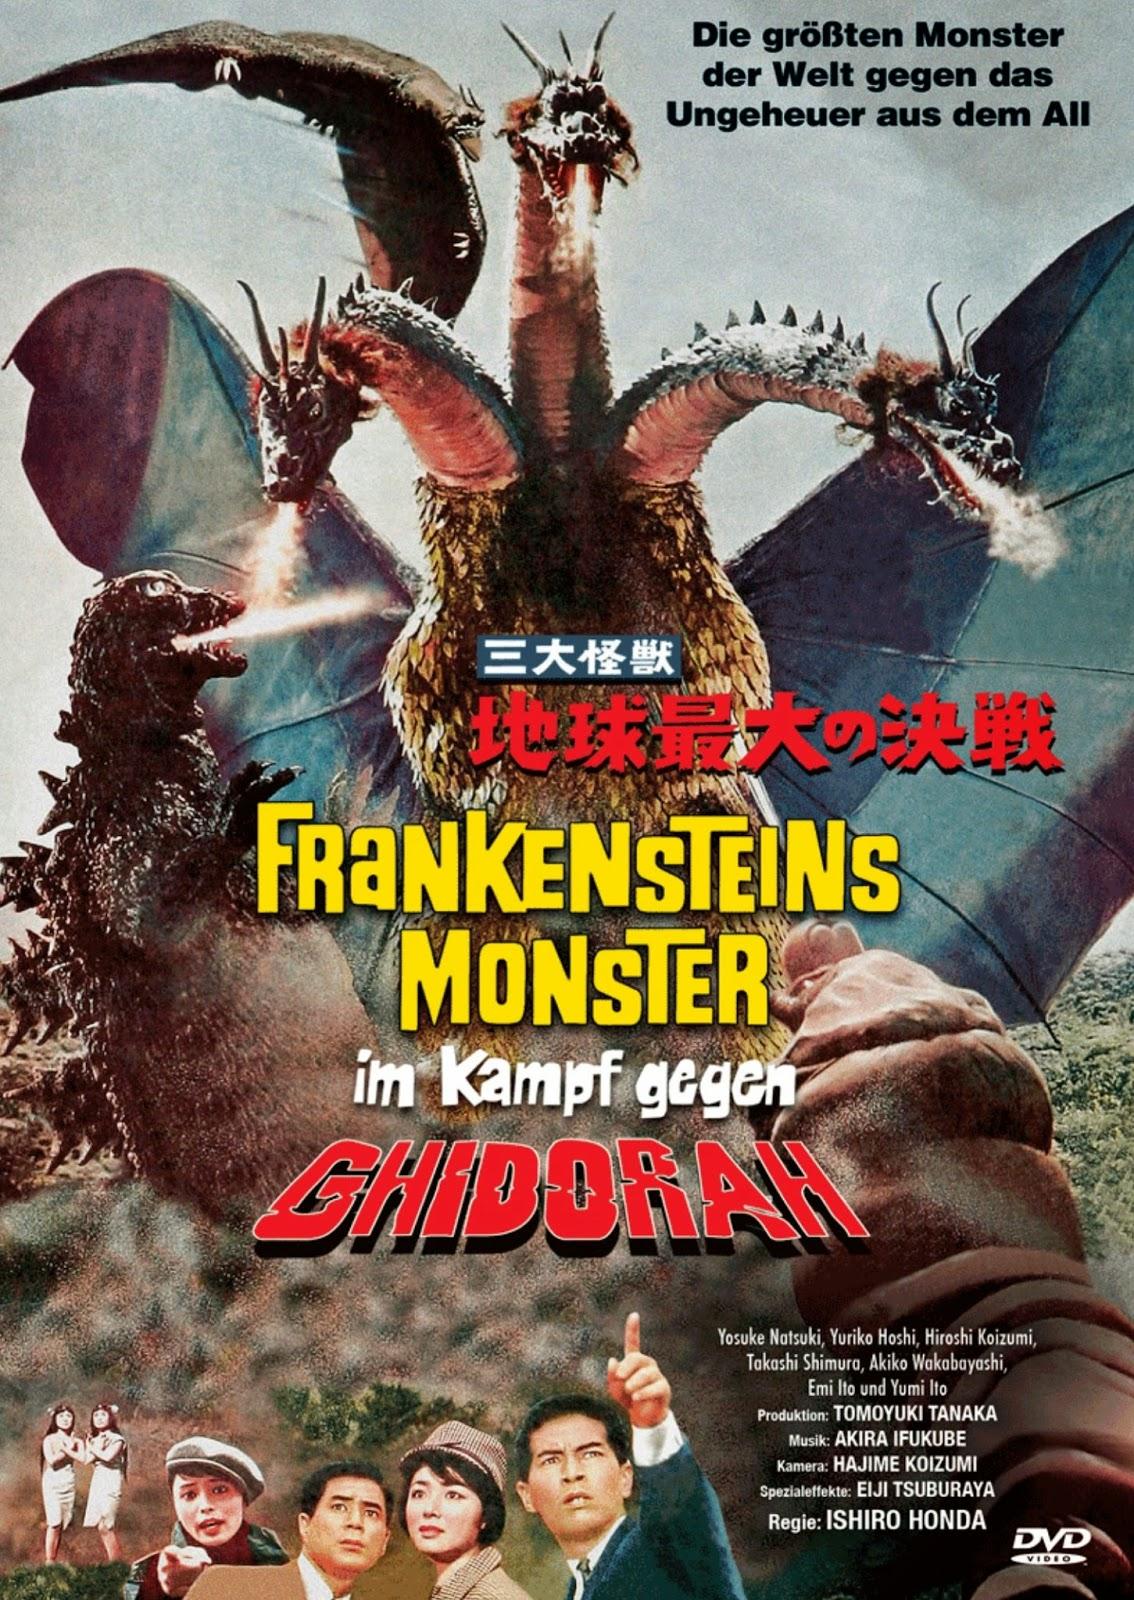 http://www.ofdb.de/film/3478,Frankensteins-Monster-im-Kampf-gegen-Ghidorah